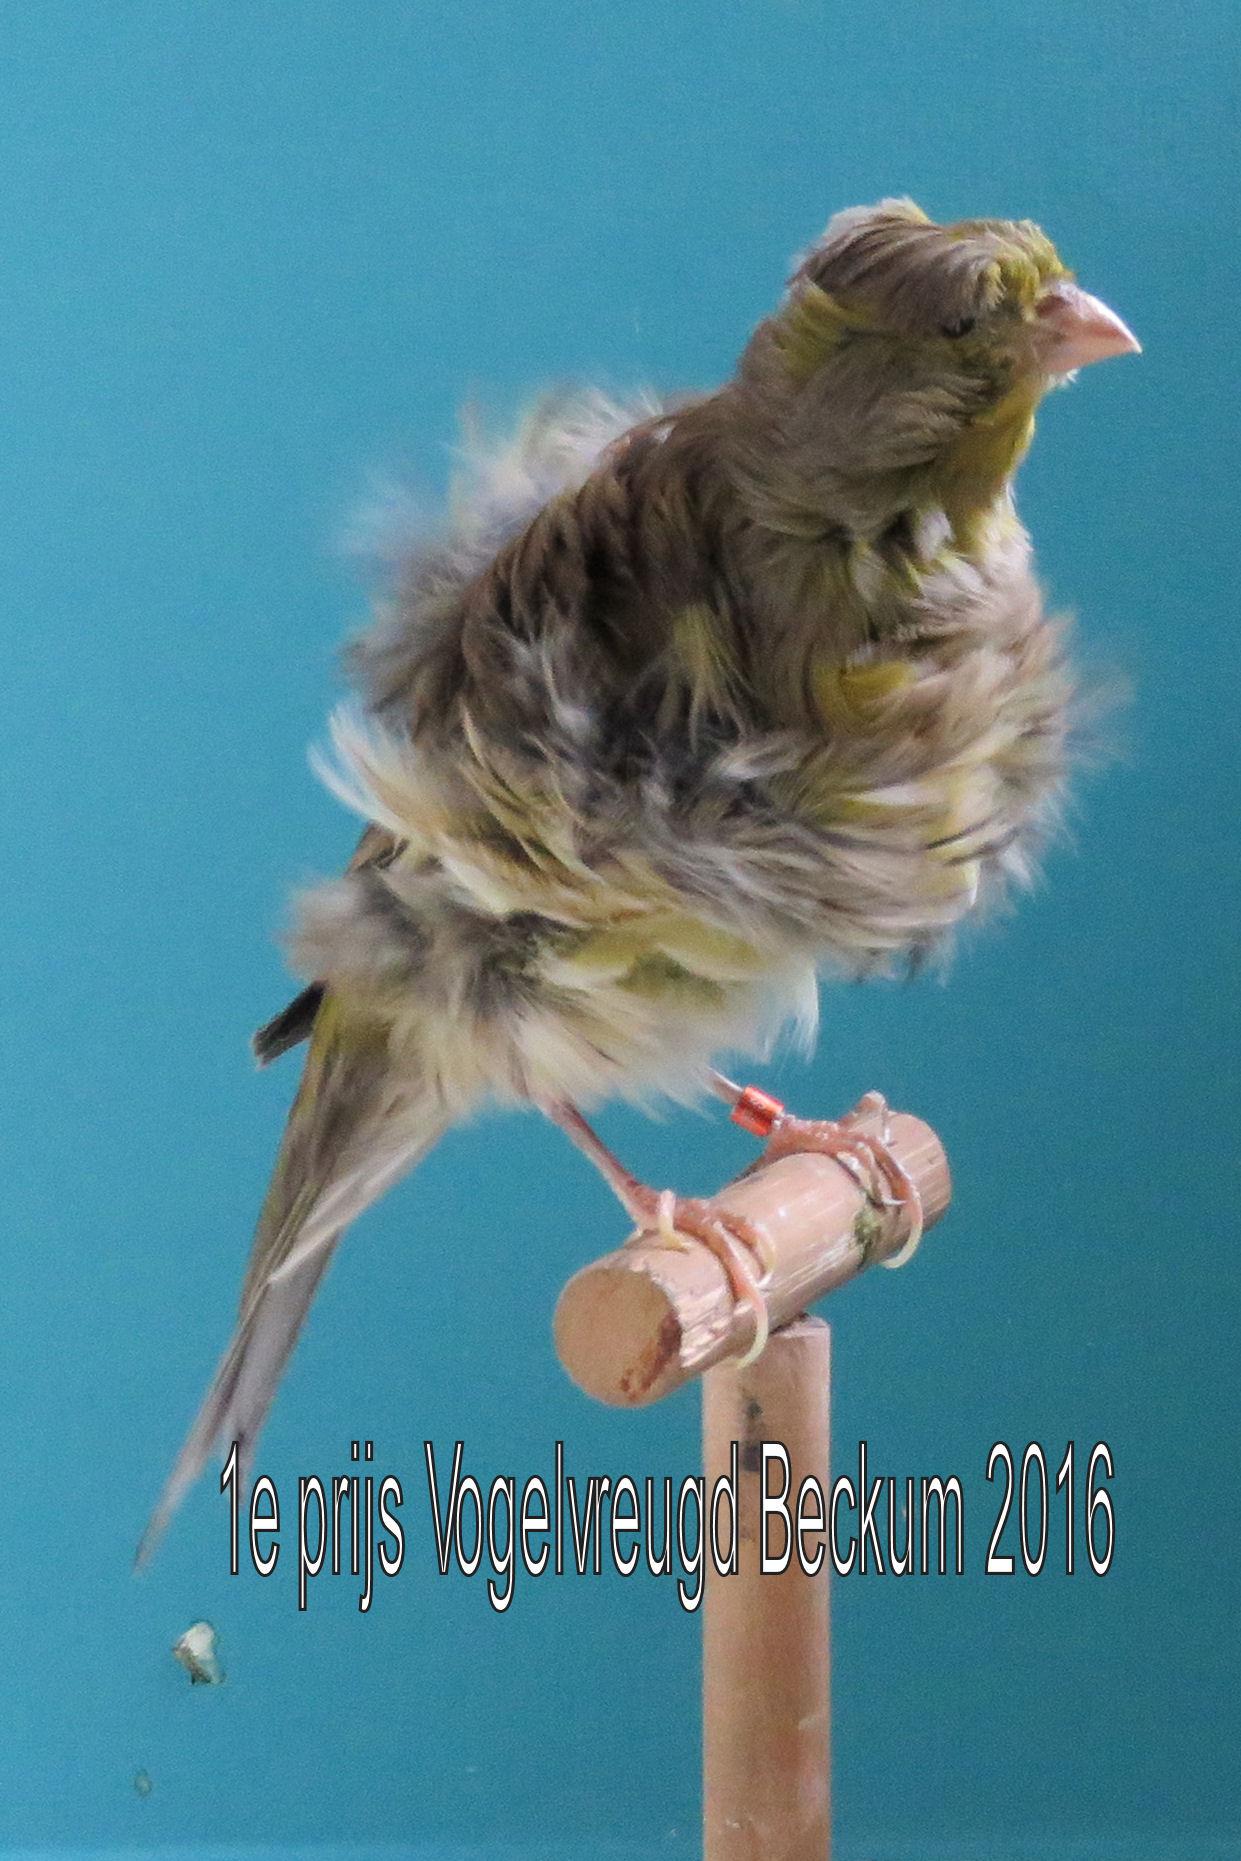 VogelvreugdBeckum2016veren 1e